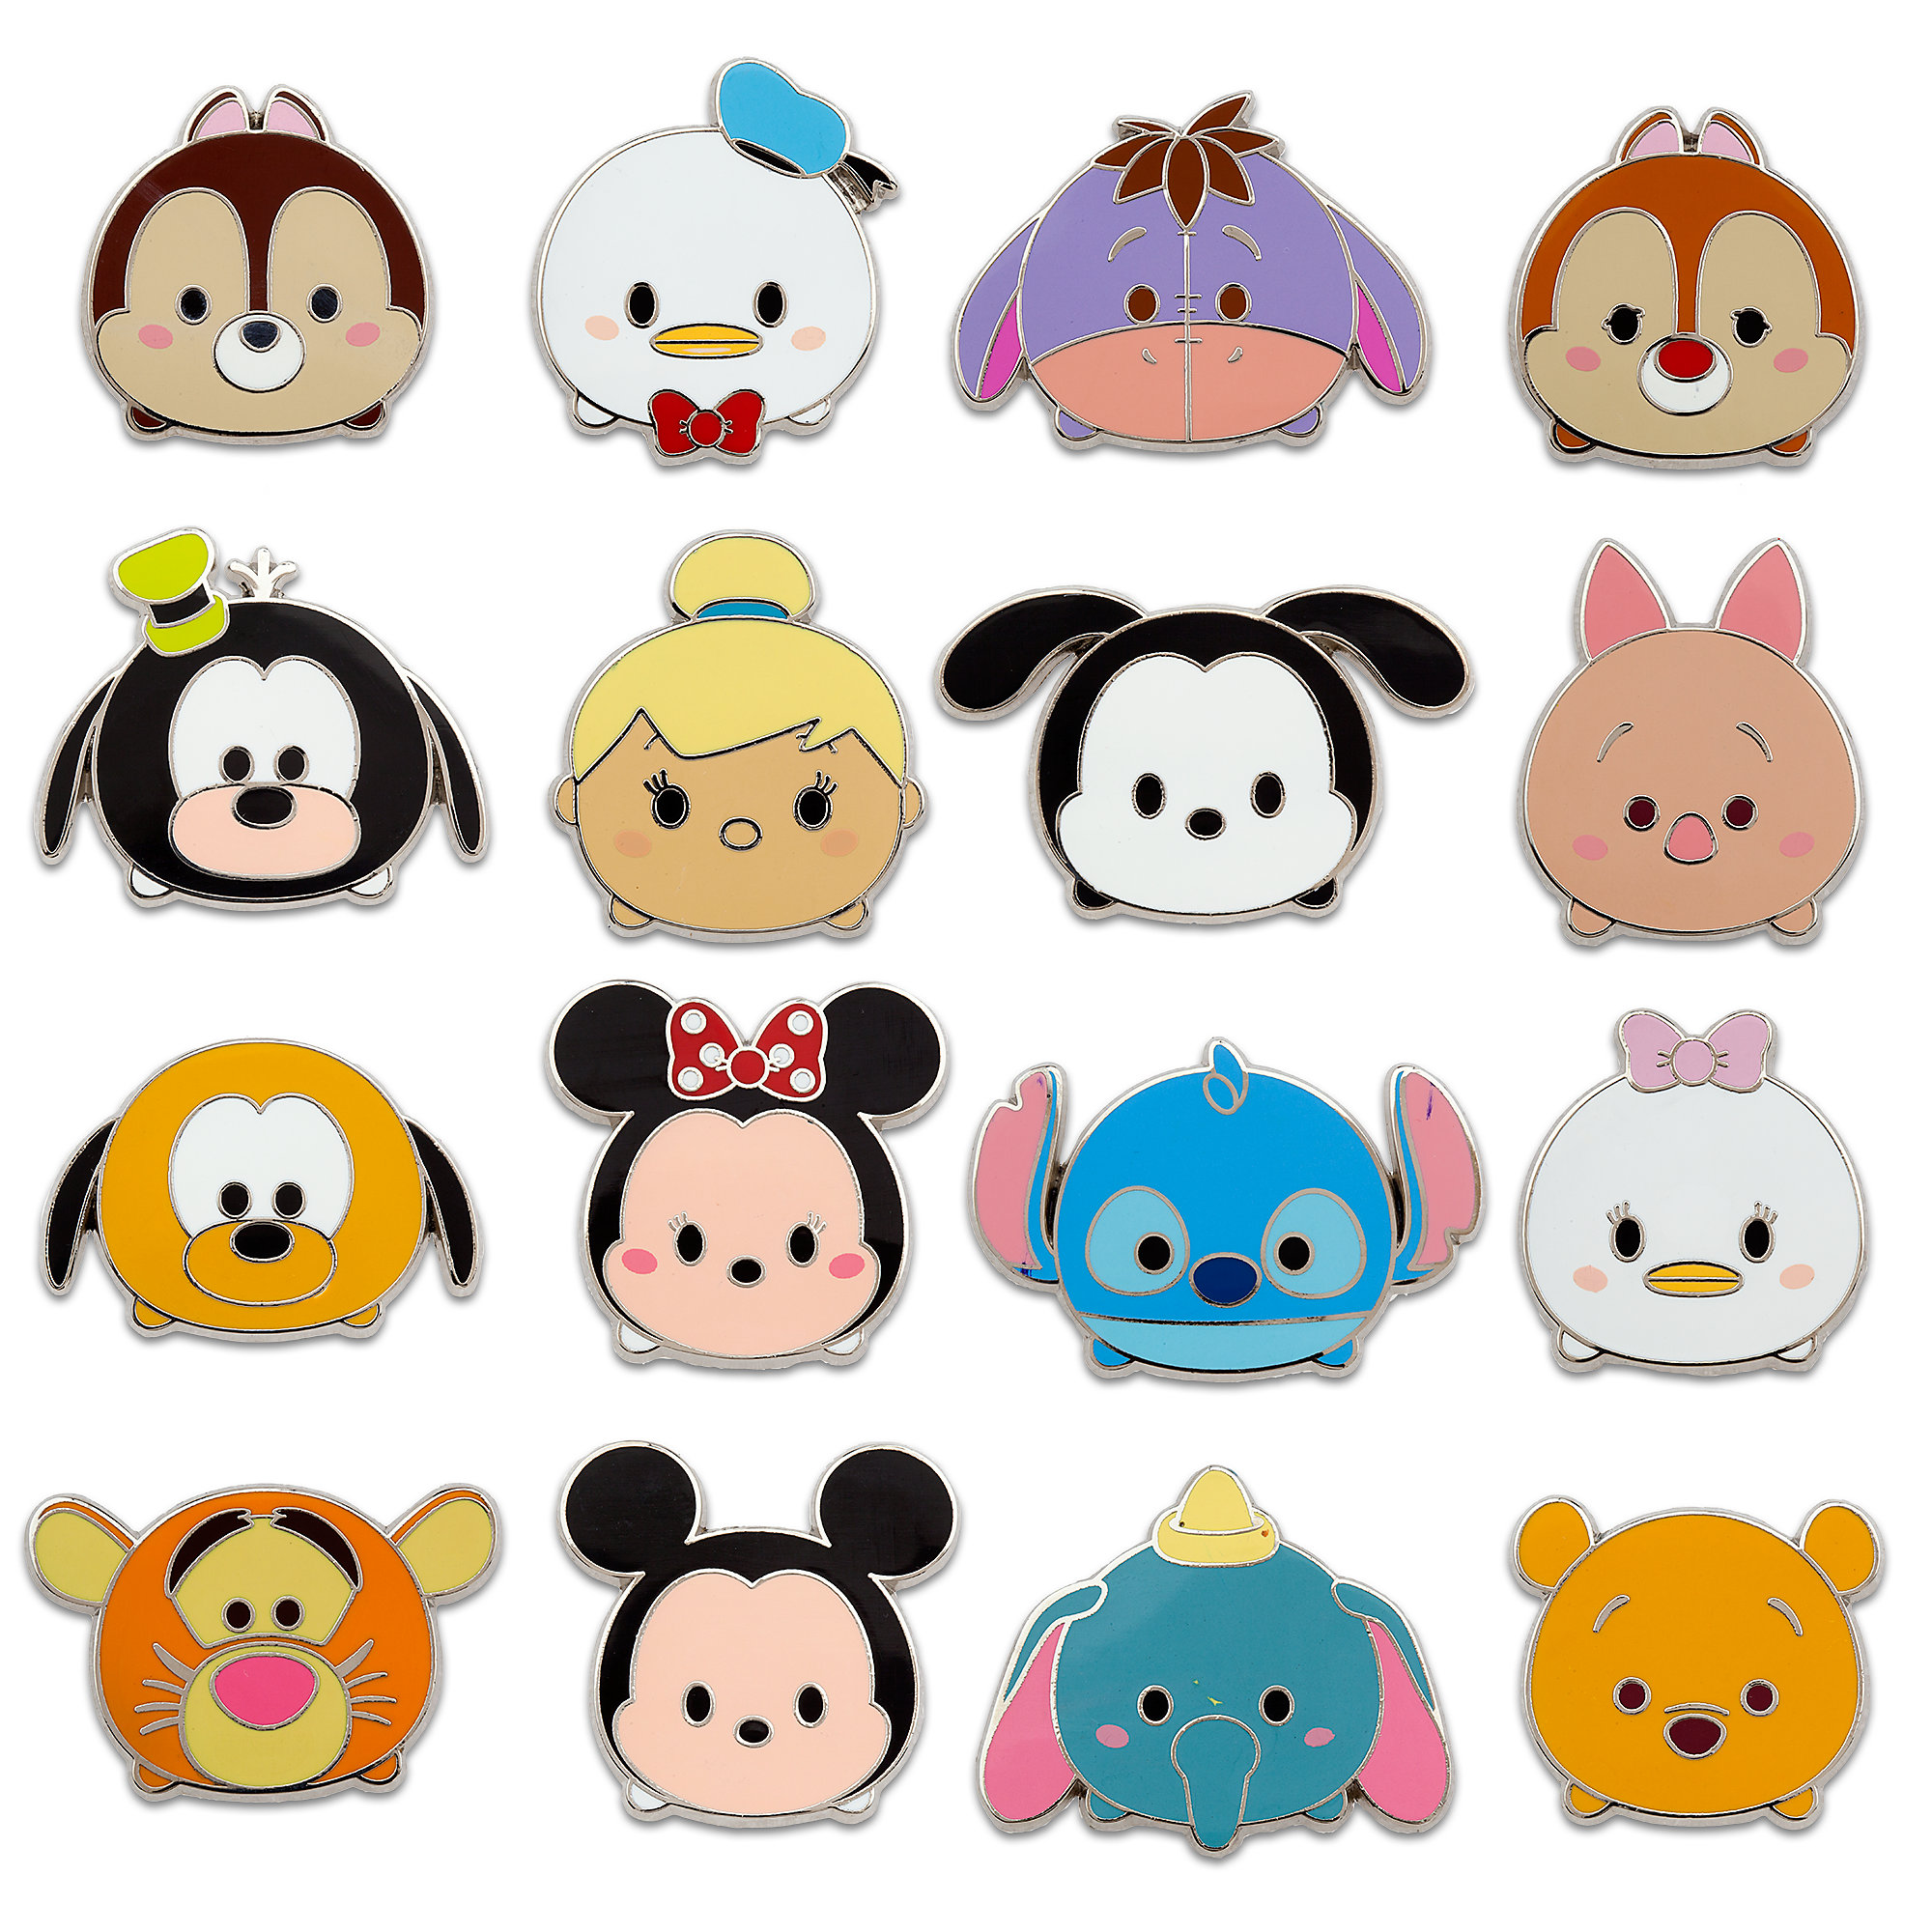 It is an image of Juicy Tsum Tsum Disney